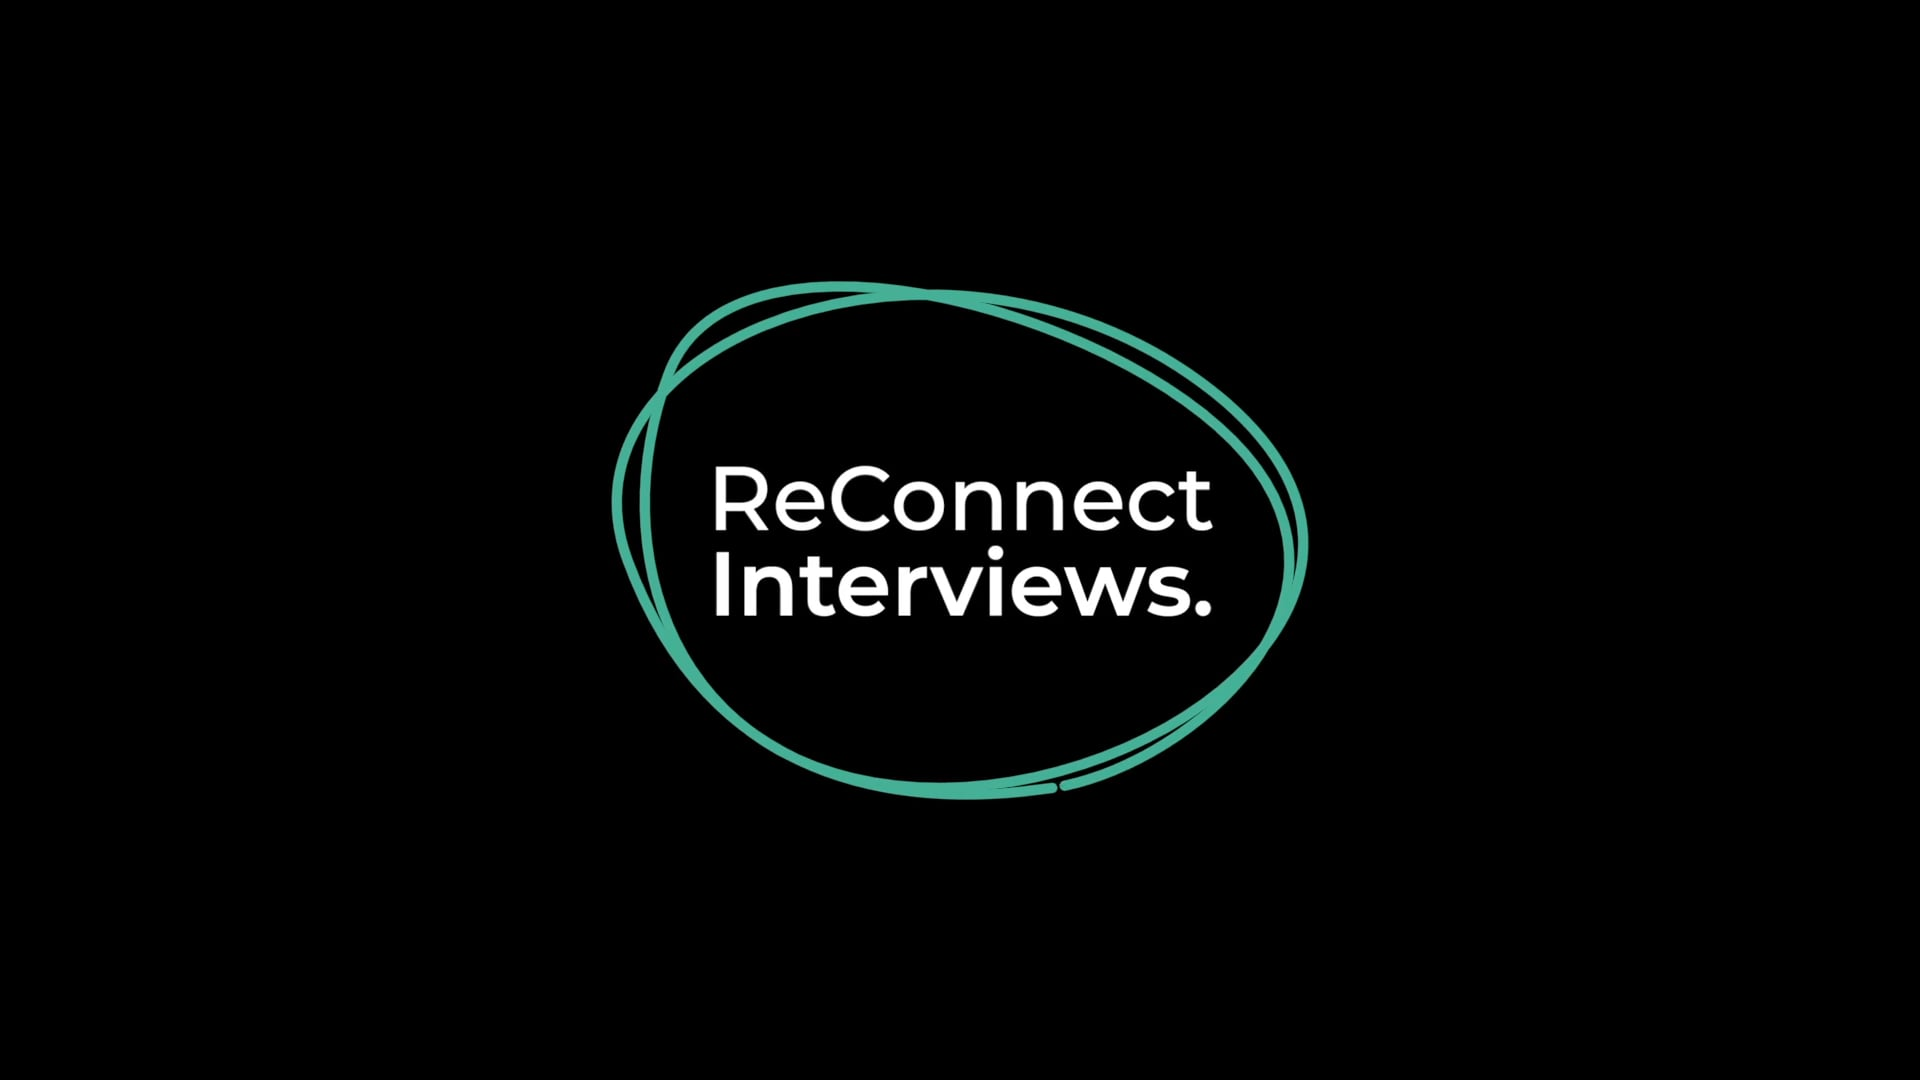 Reconnect Testimonials